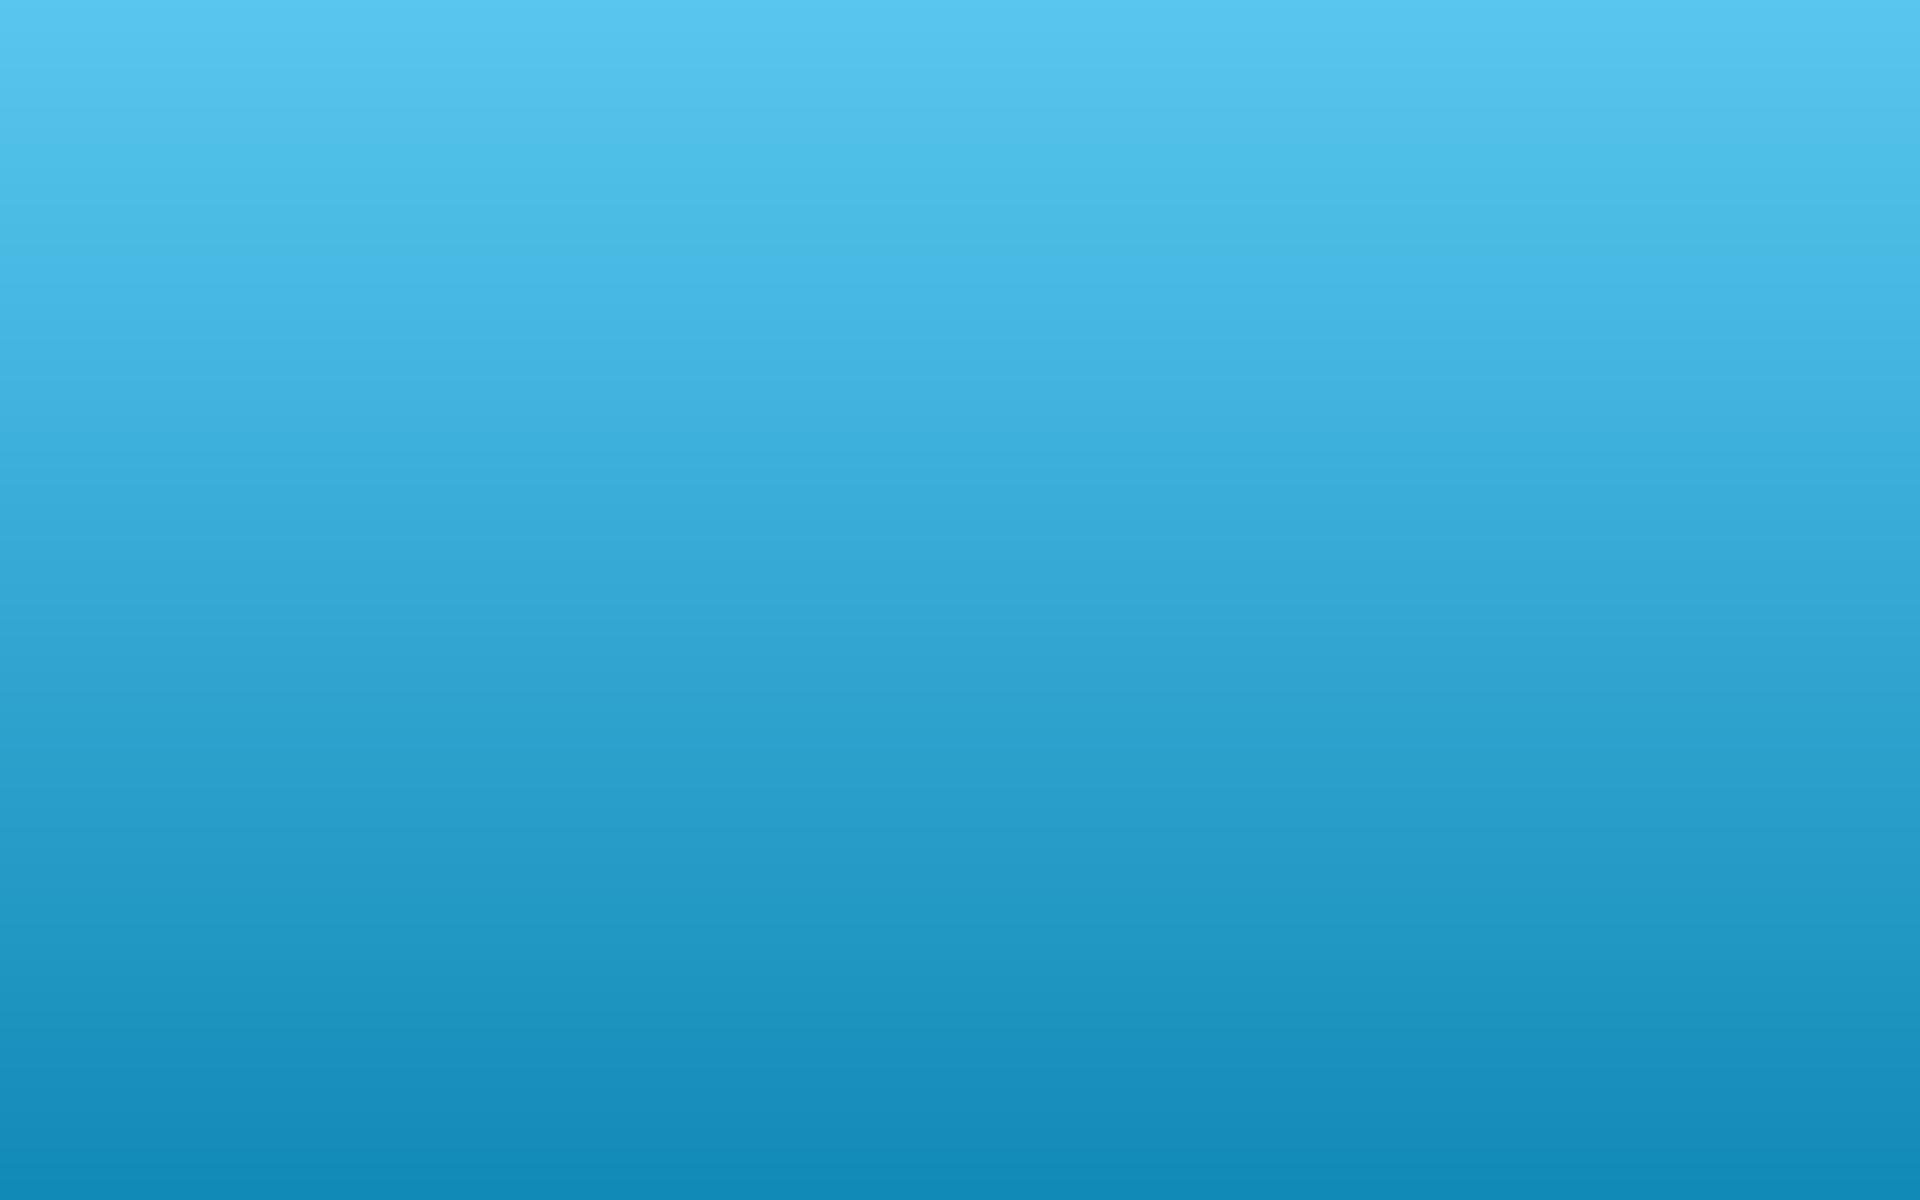 BlueBak3